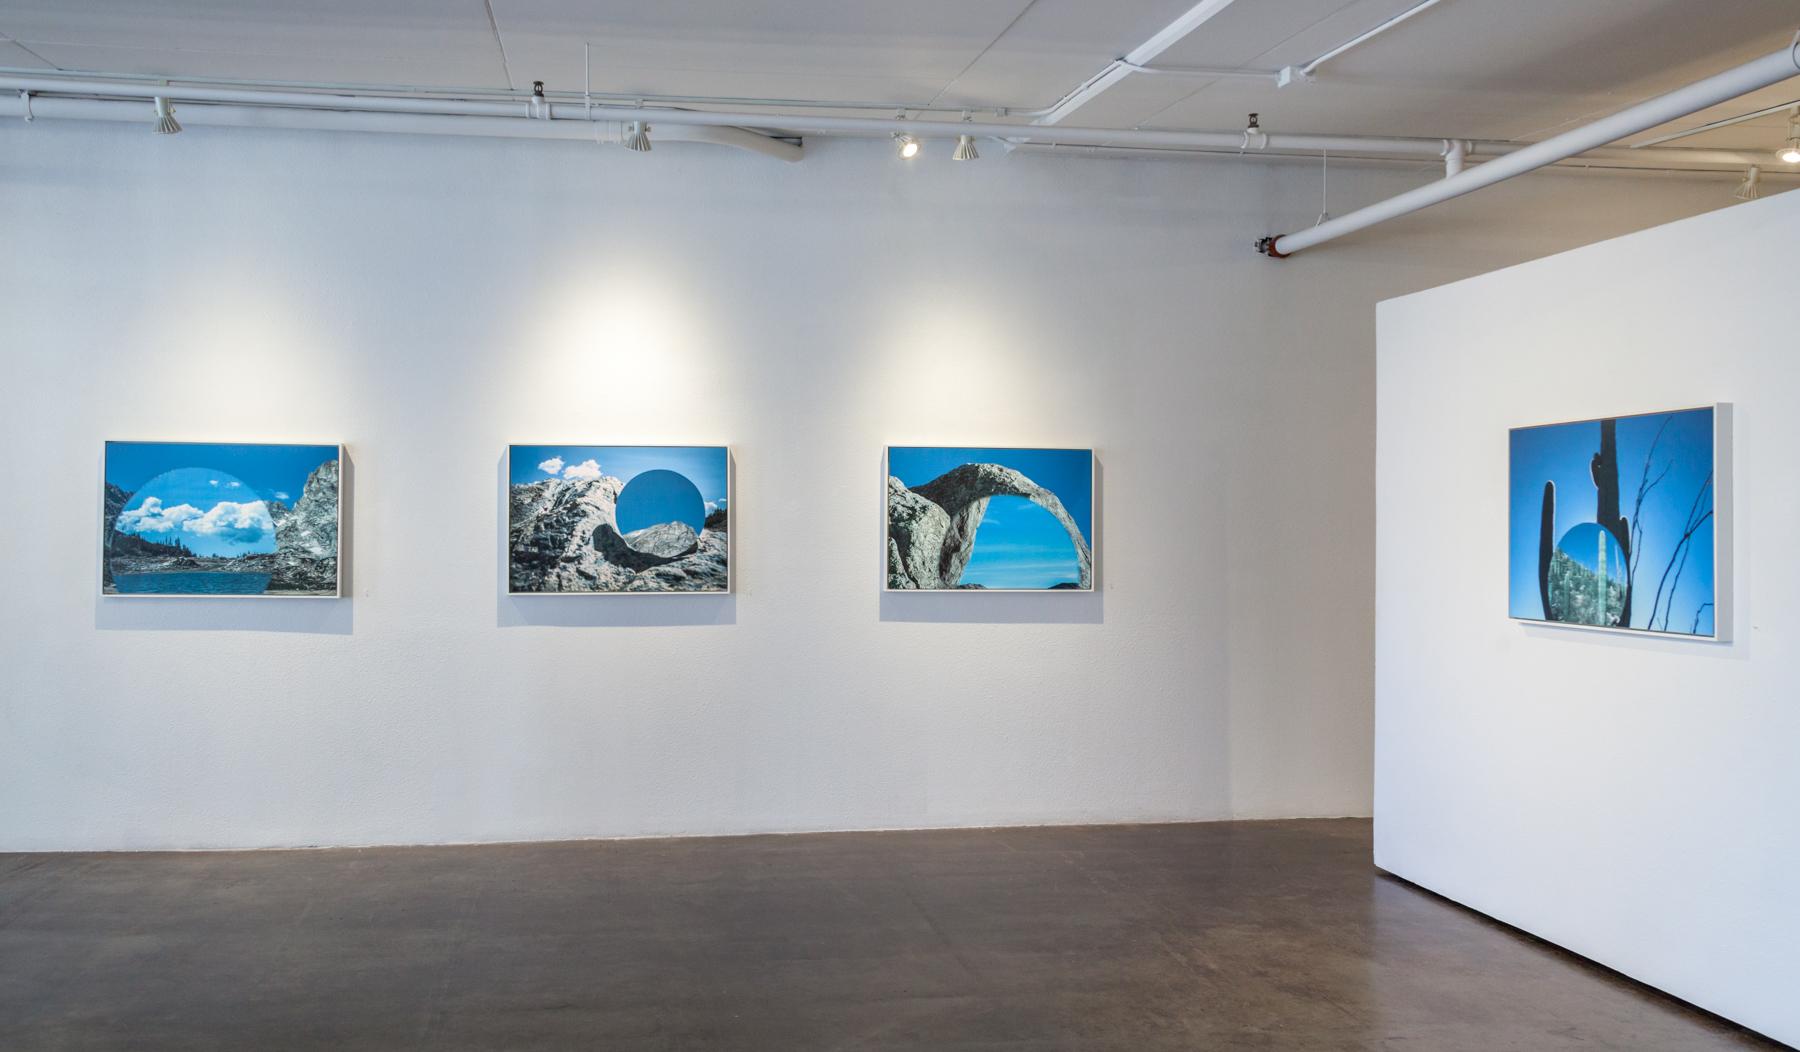 Installation View - Walker Fine Art, Denver, CO - March 2018